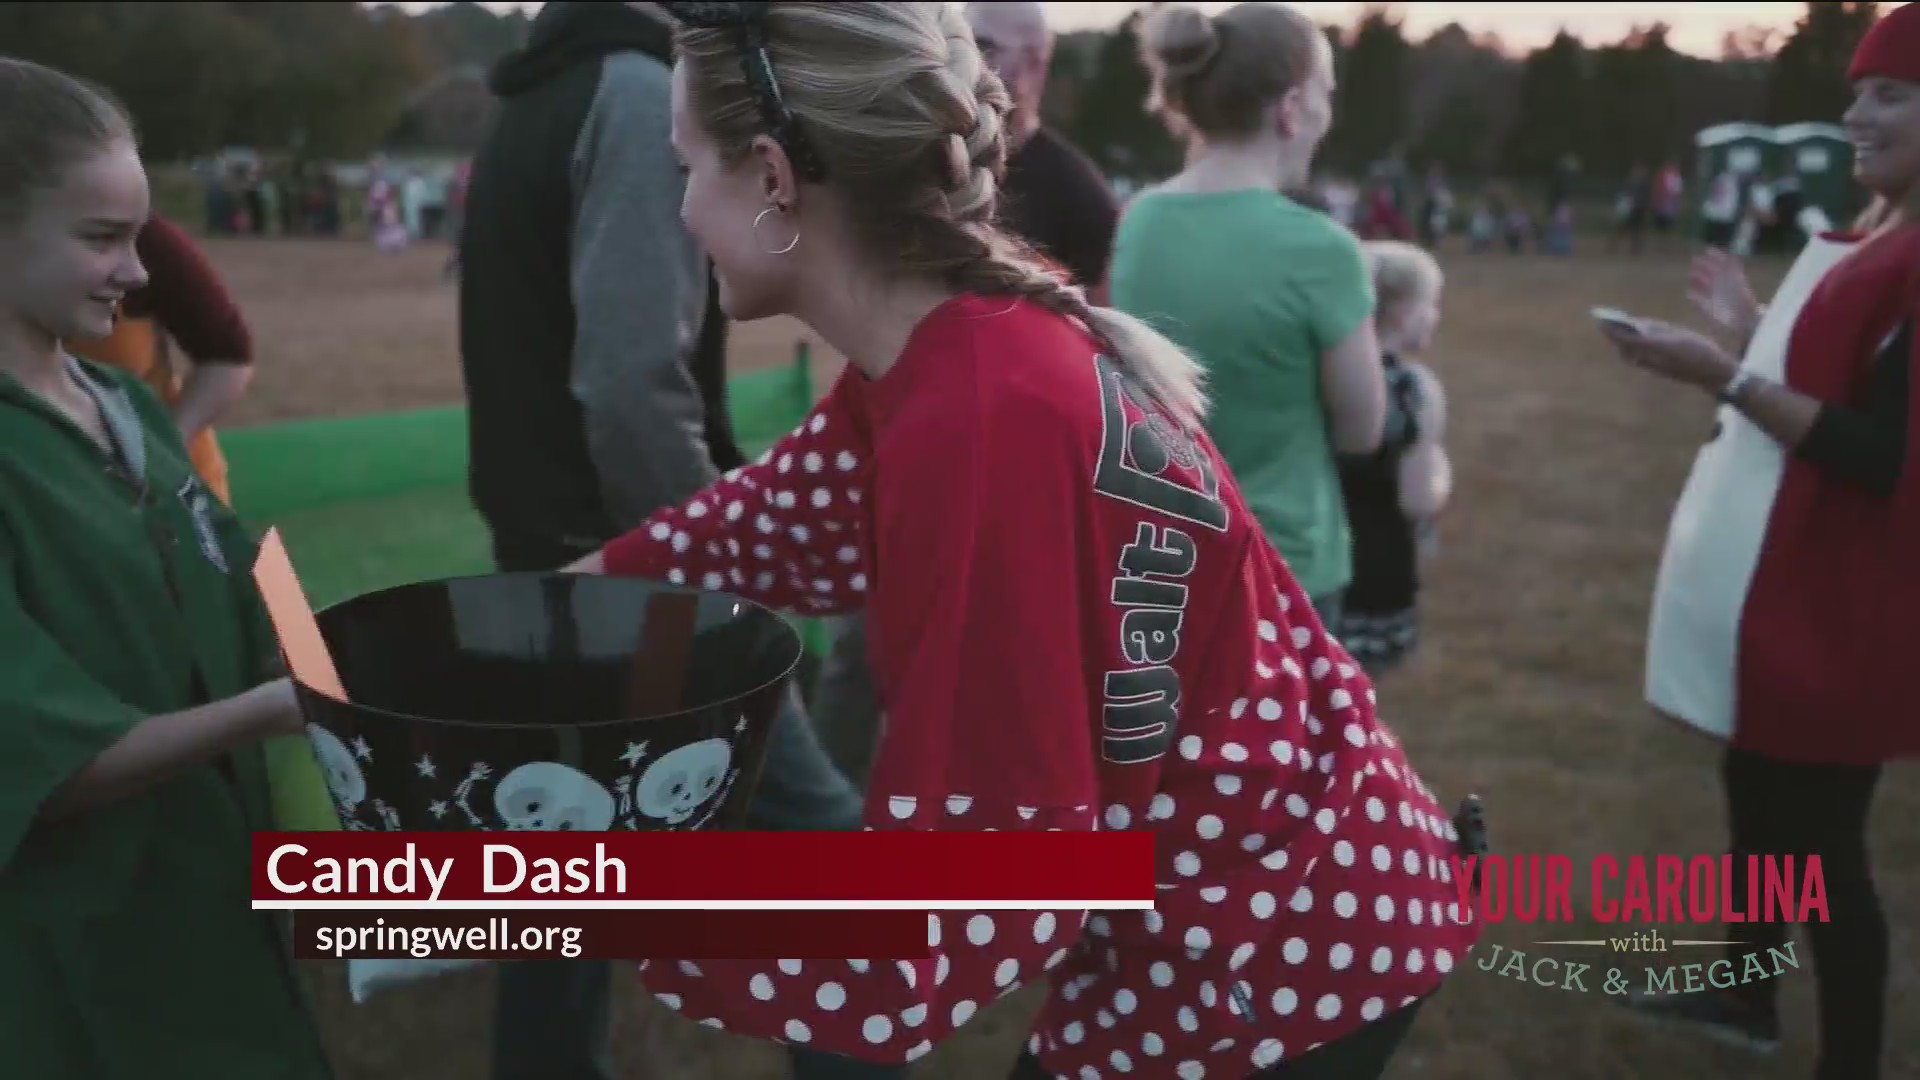 Candy Dash at Springwell Church